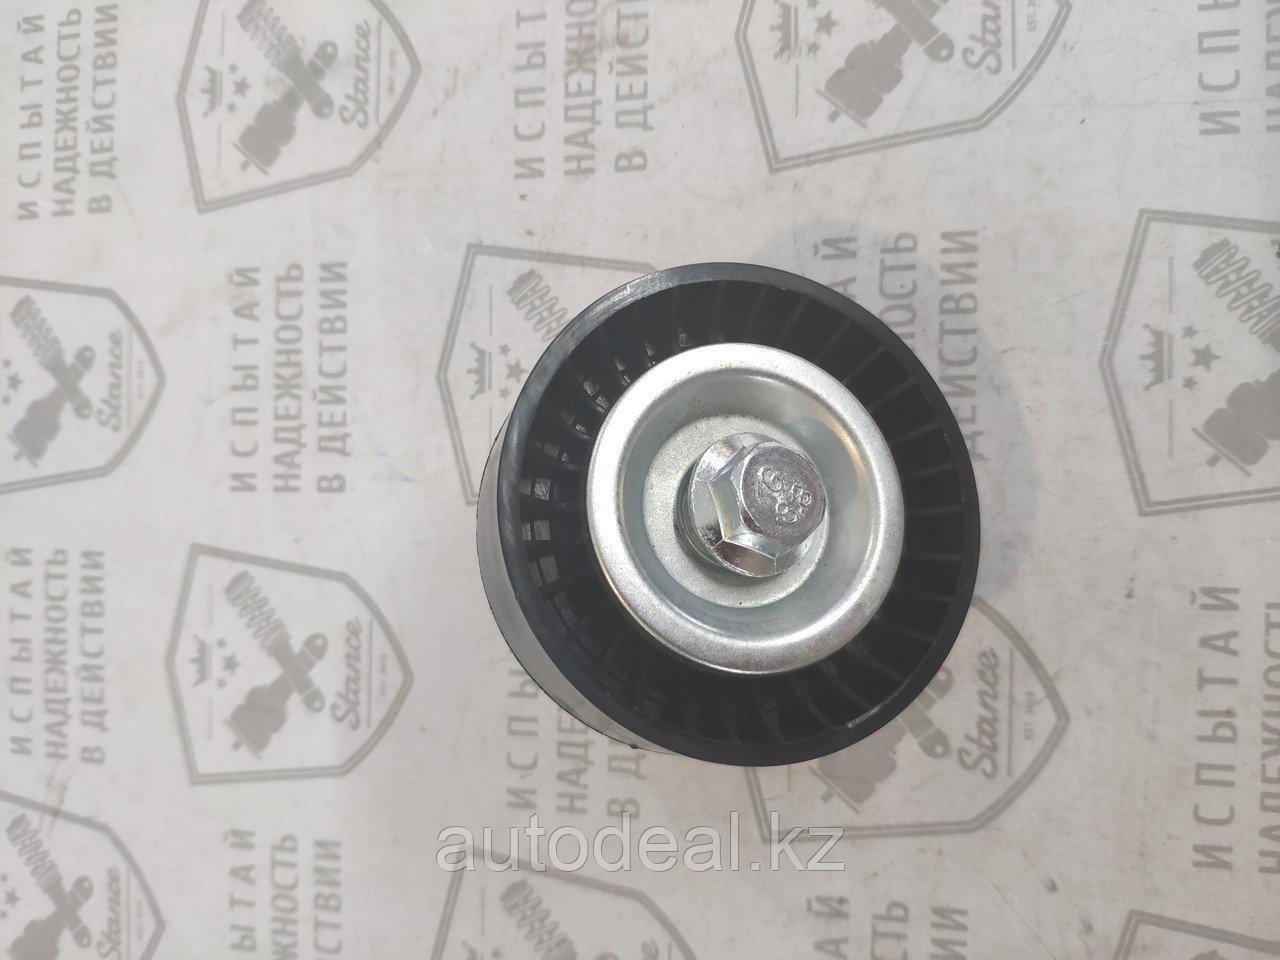 Ролик приводного ремня Geele SC7 (пластик)